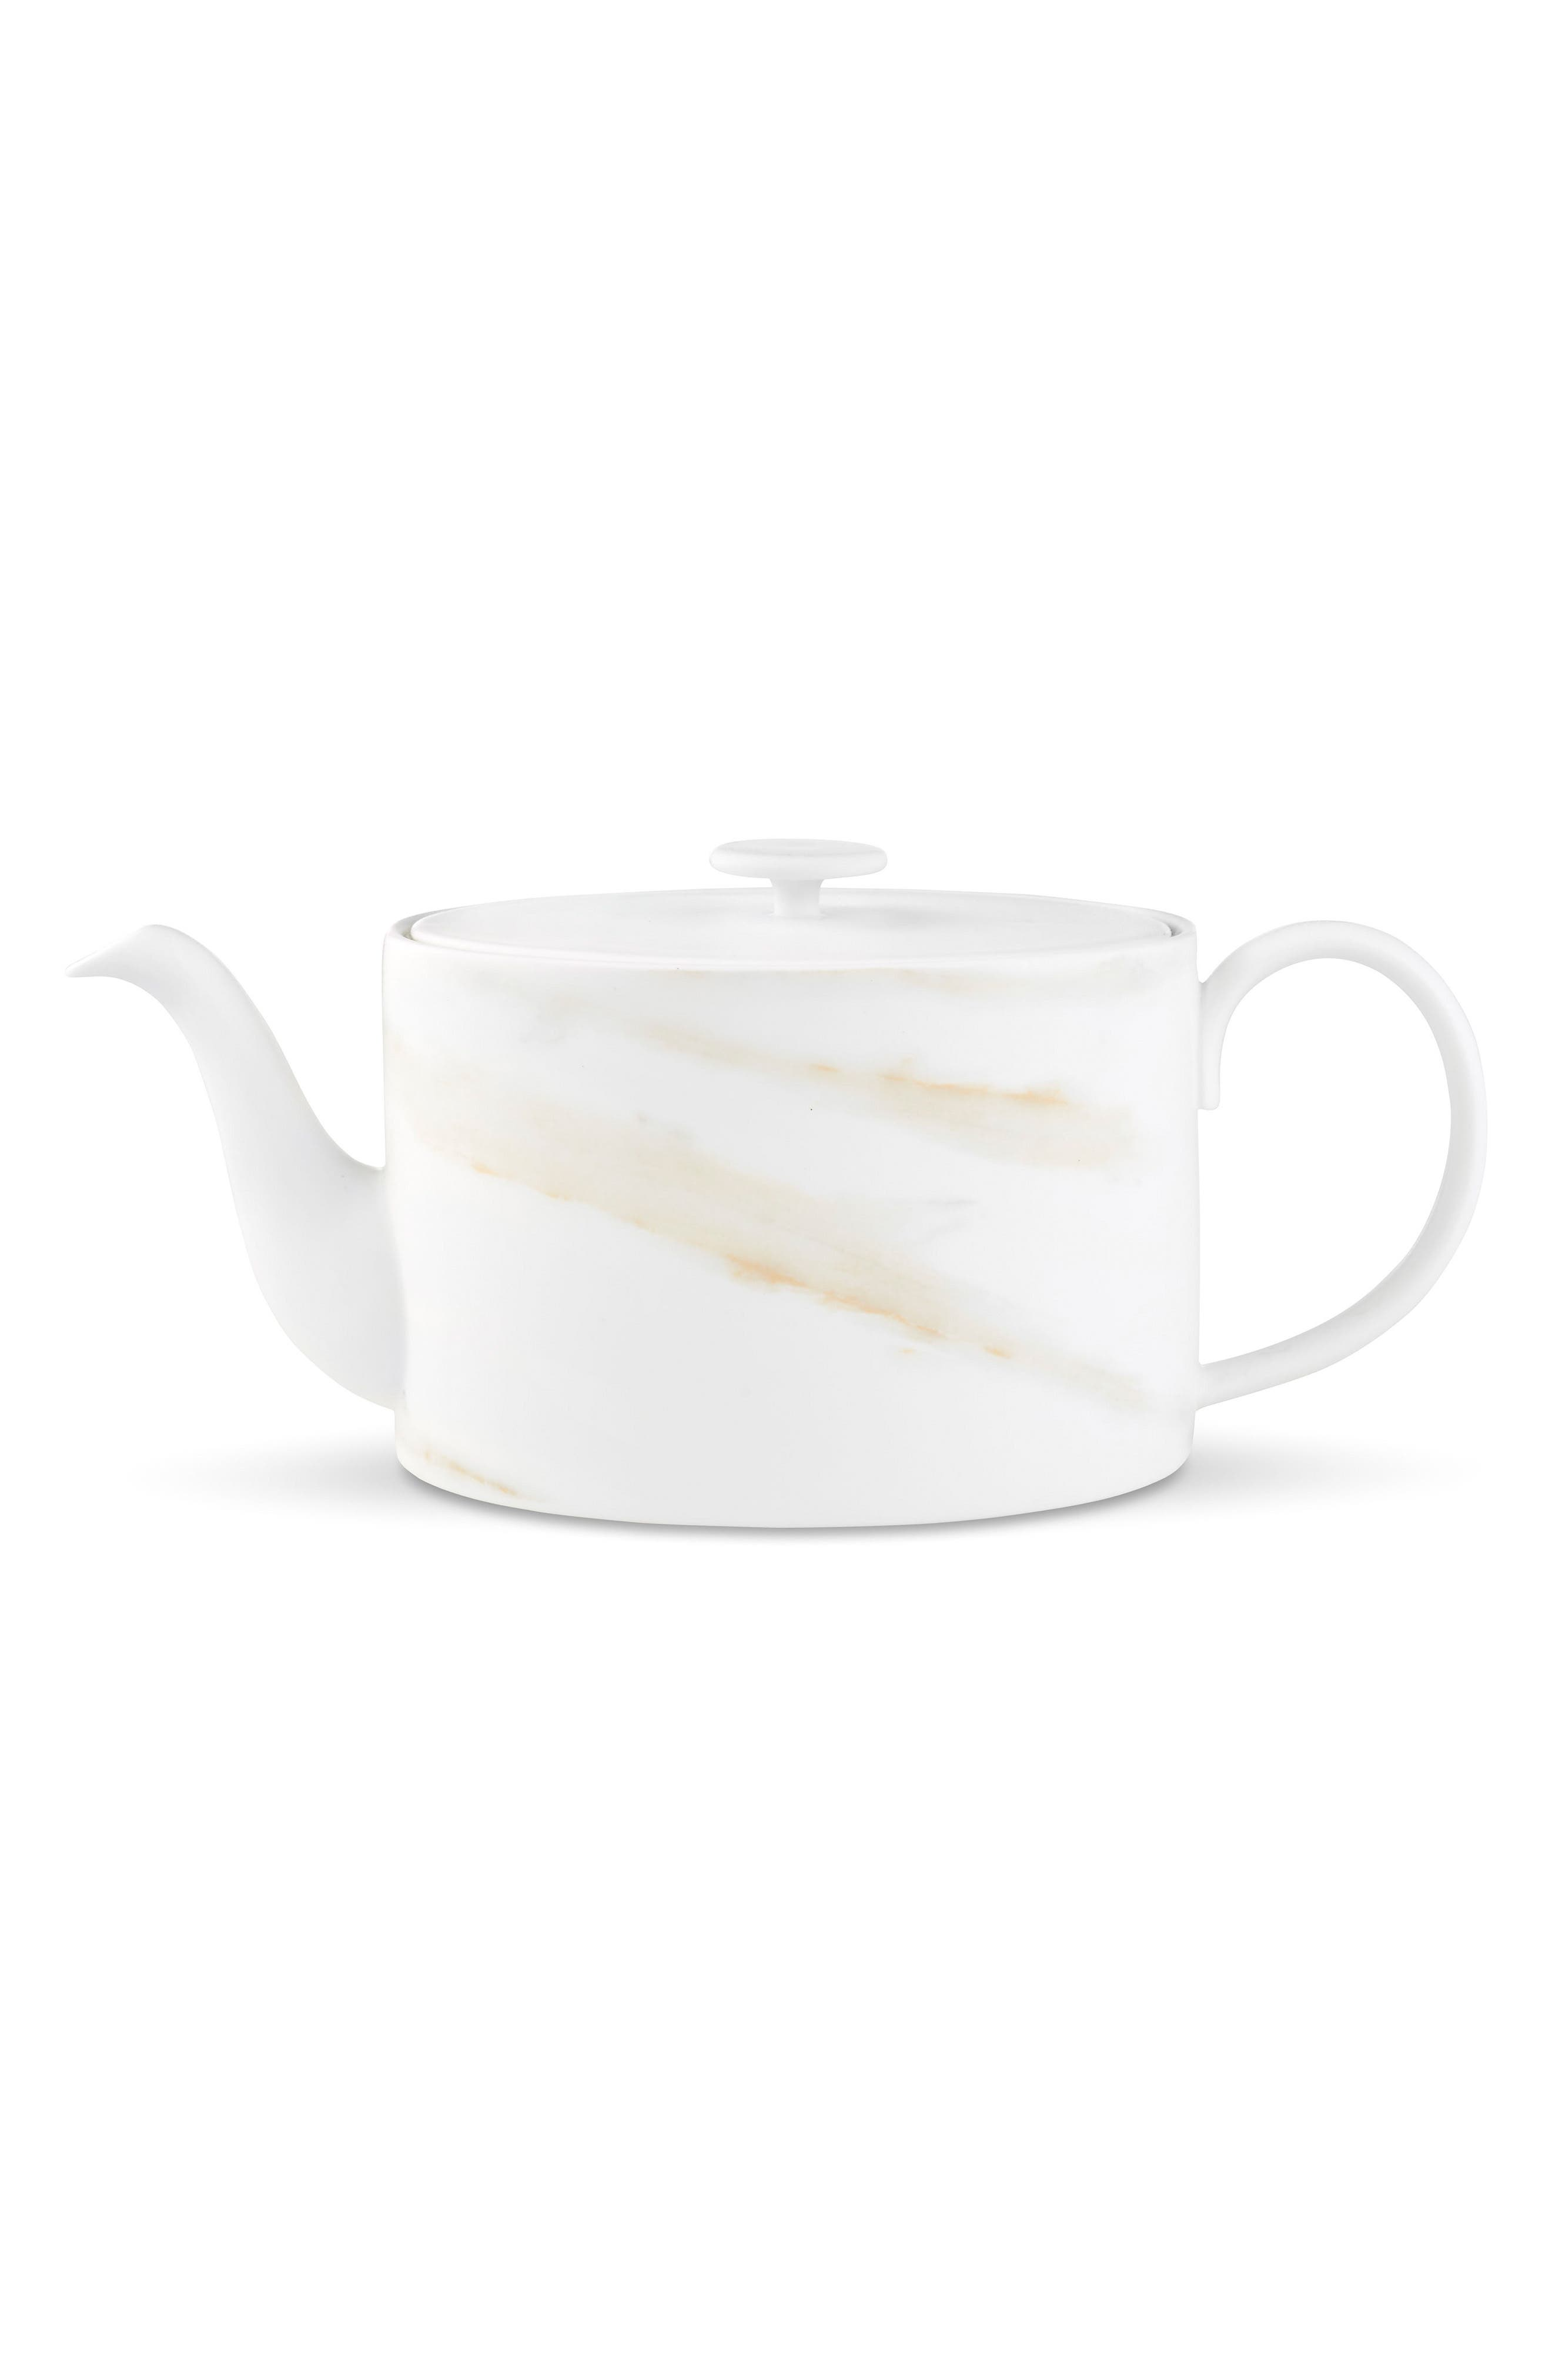 x Wedgwood Venato Imperial Teapot,                         Main,                         color, 100